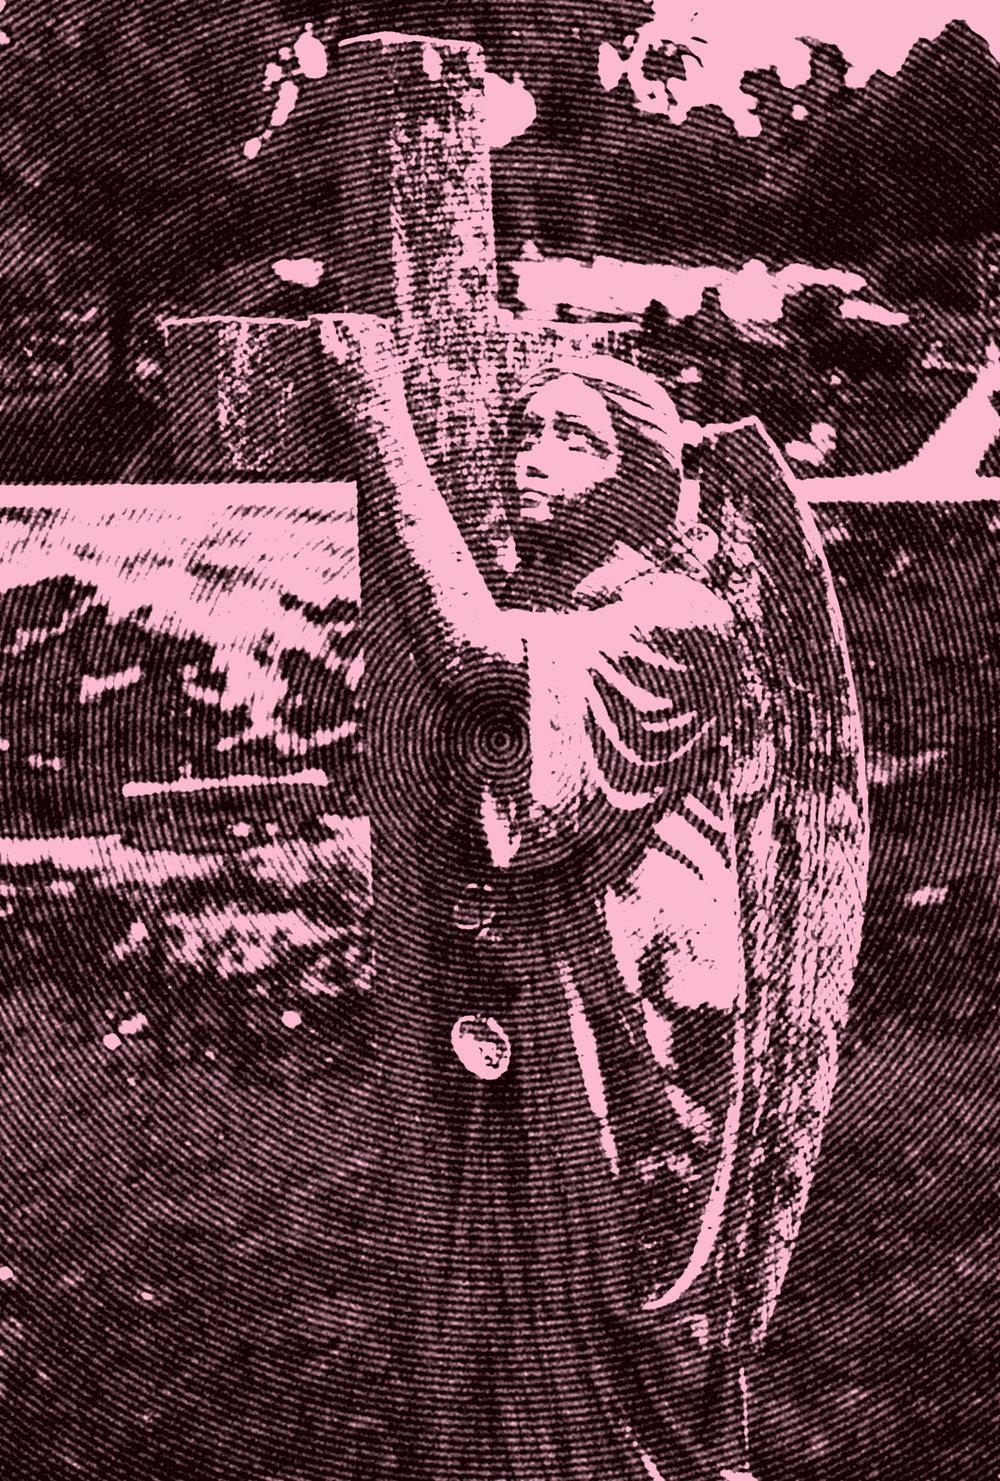 angelcrosscircle.jpg